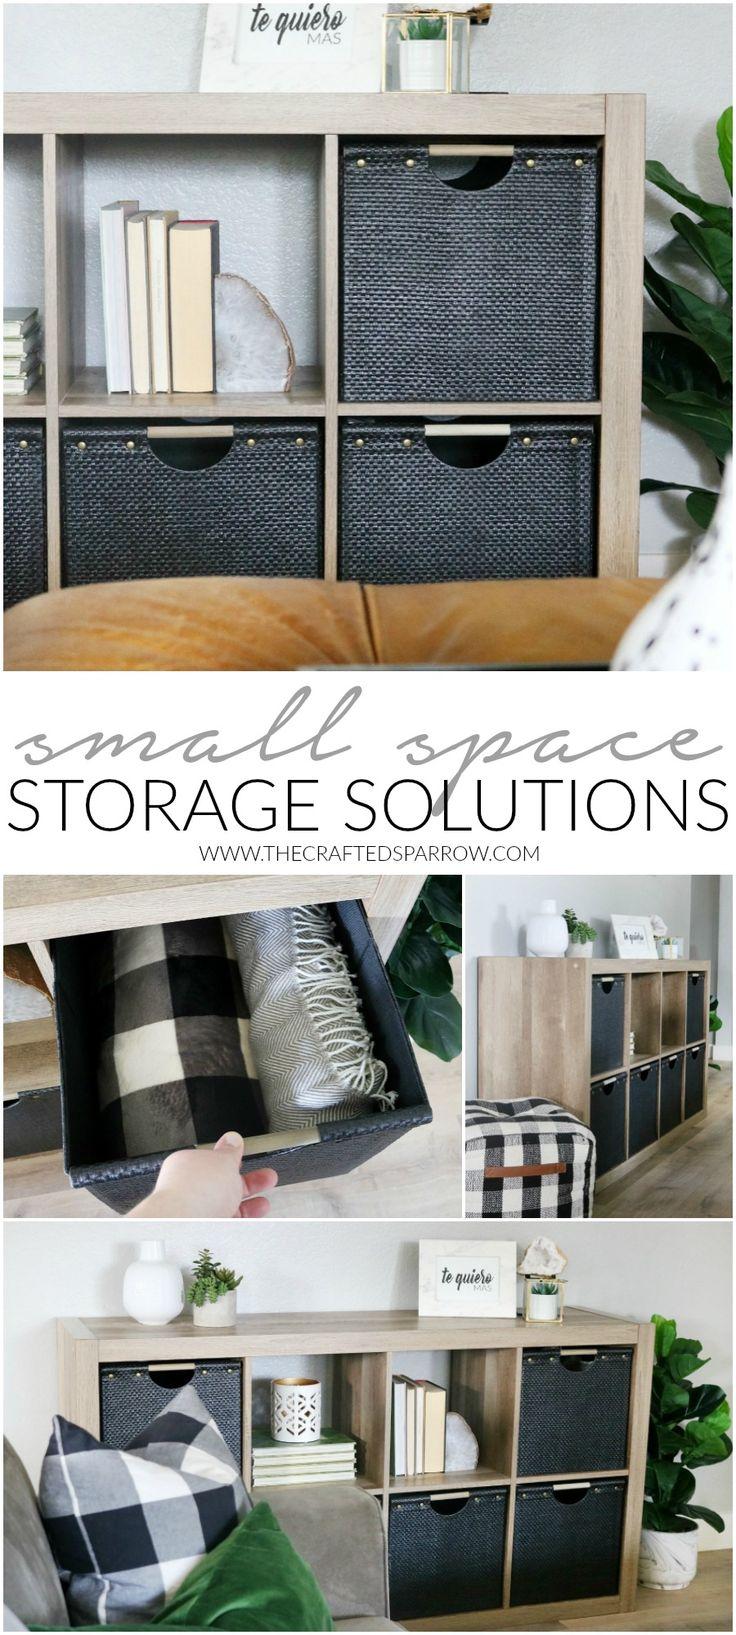 Small Space Storage Solutions     #BHGLiveBetter #ad #Storage #organization